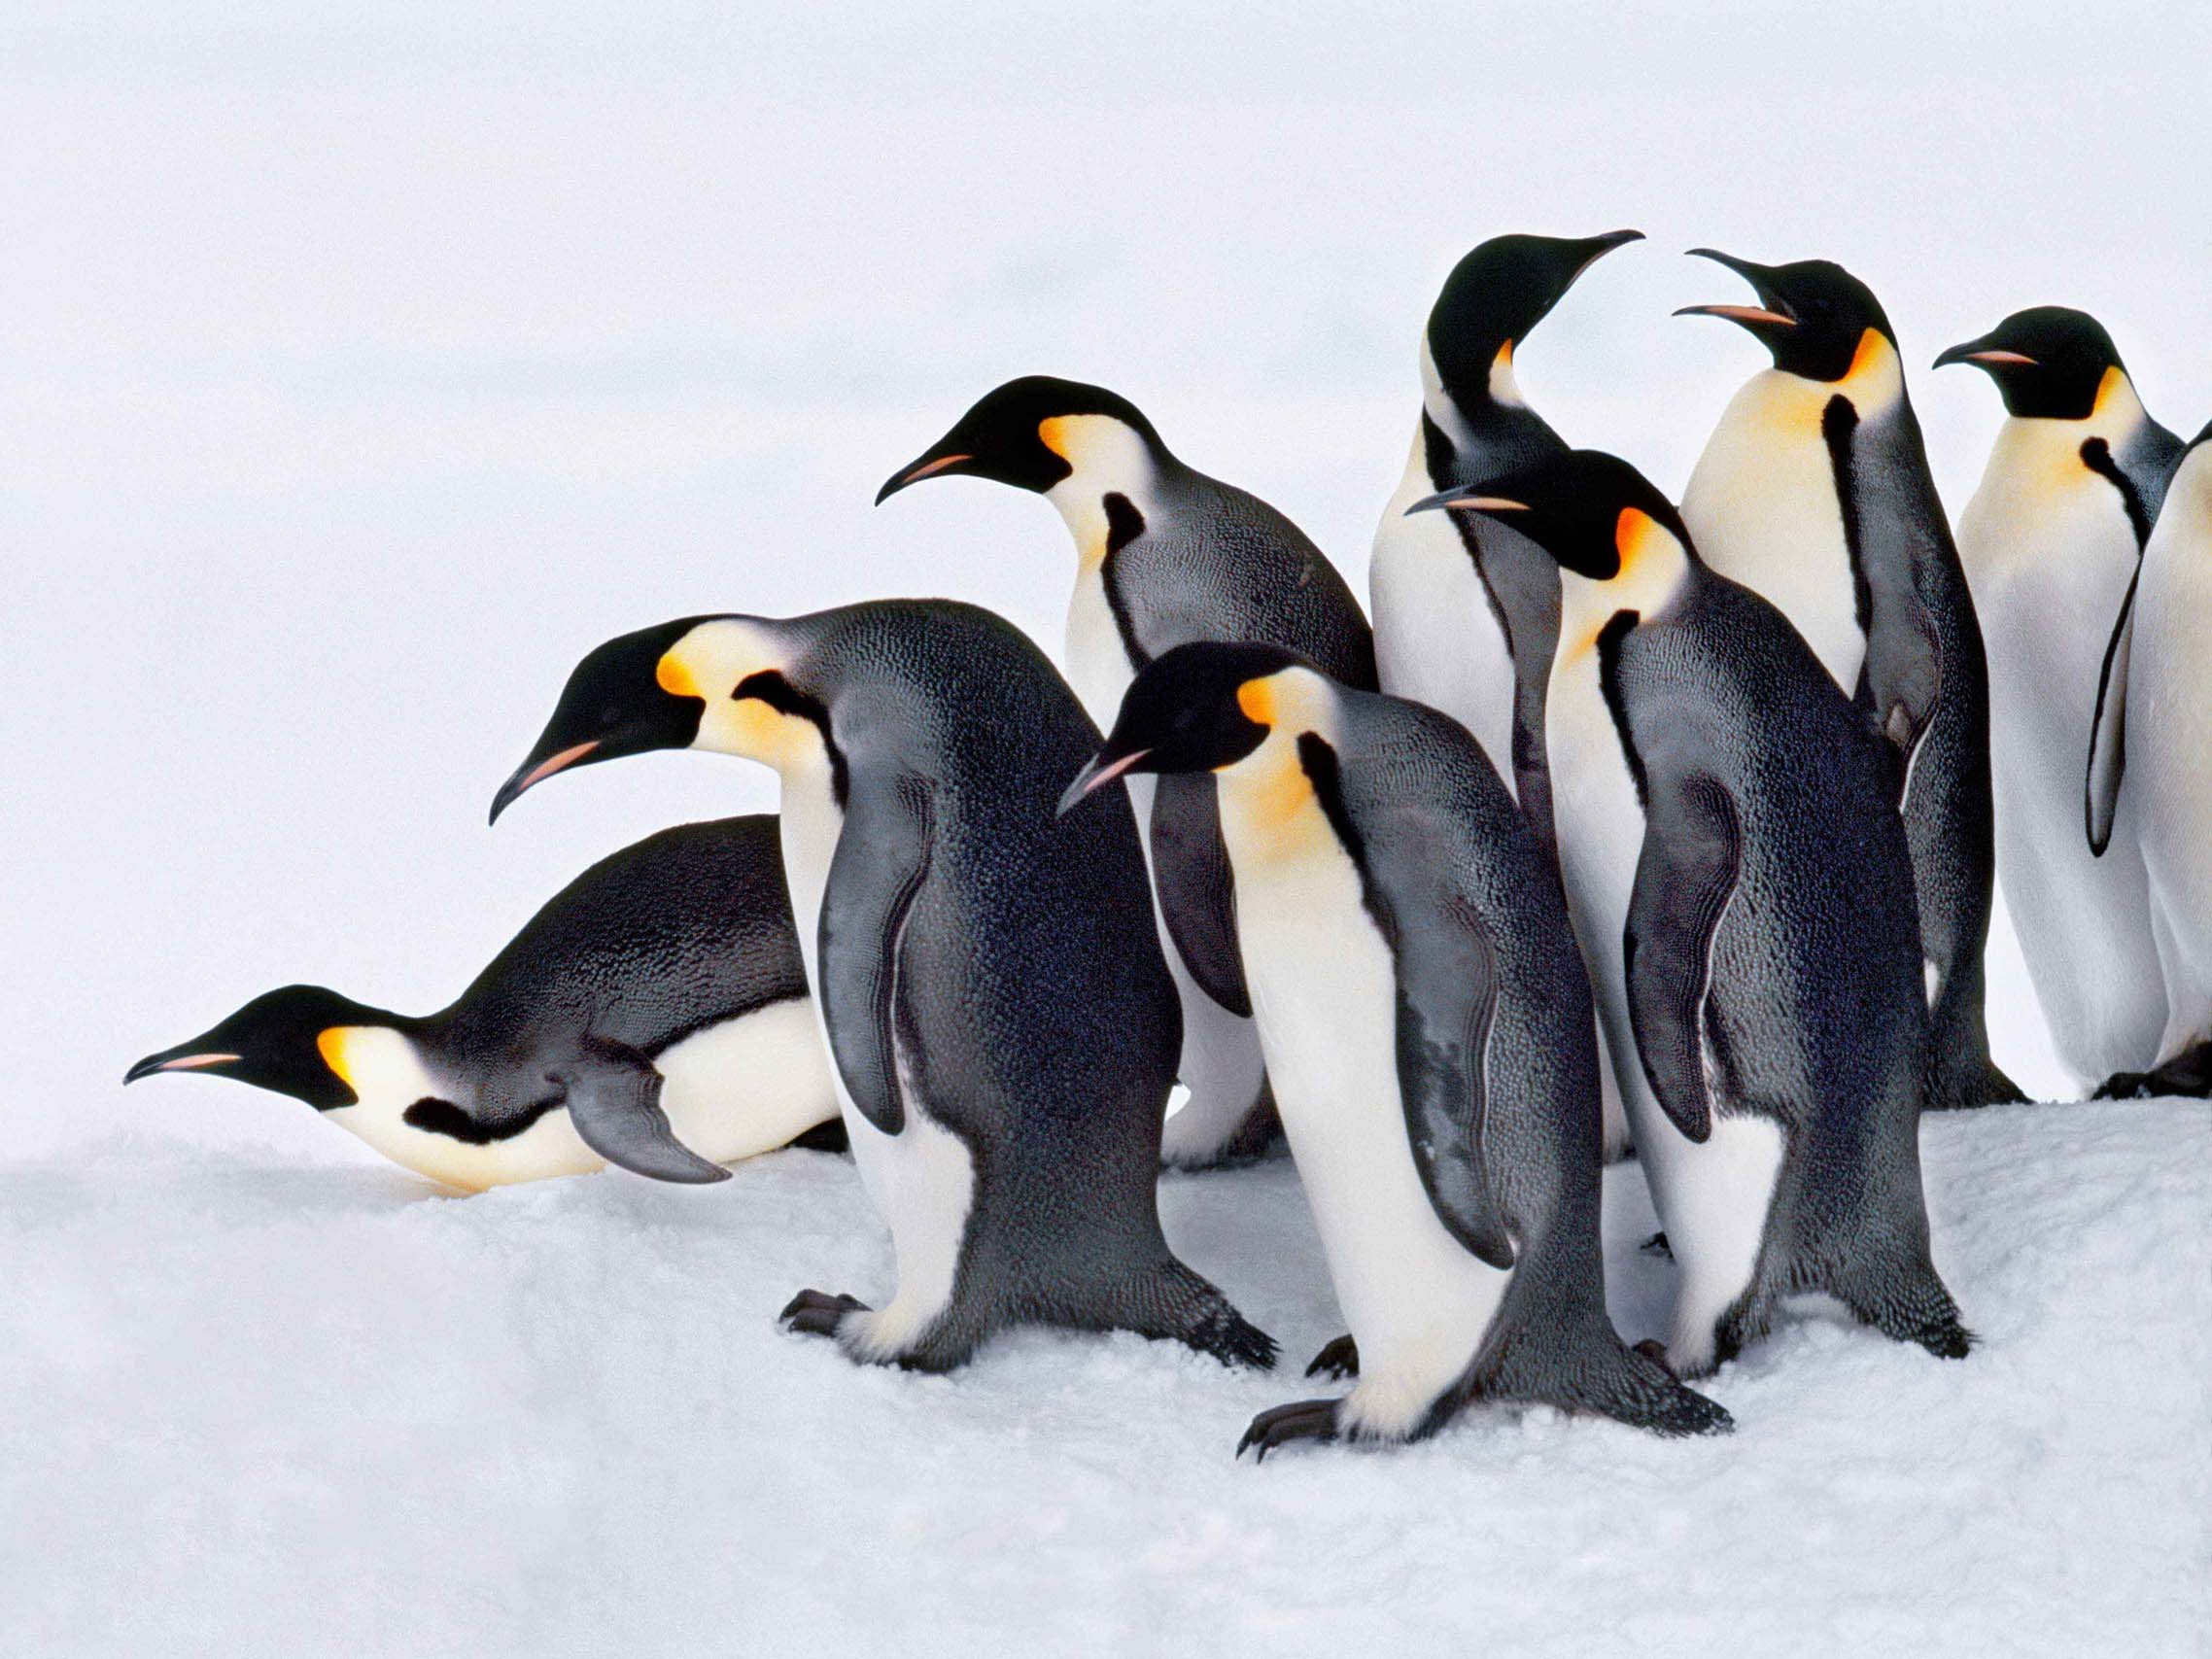 meet the penguins scholastic rh scholastic com 9 Grade Classroom 12 Grade Classroom